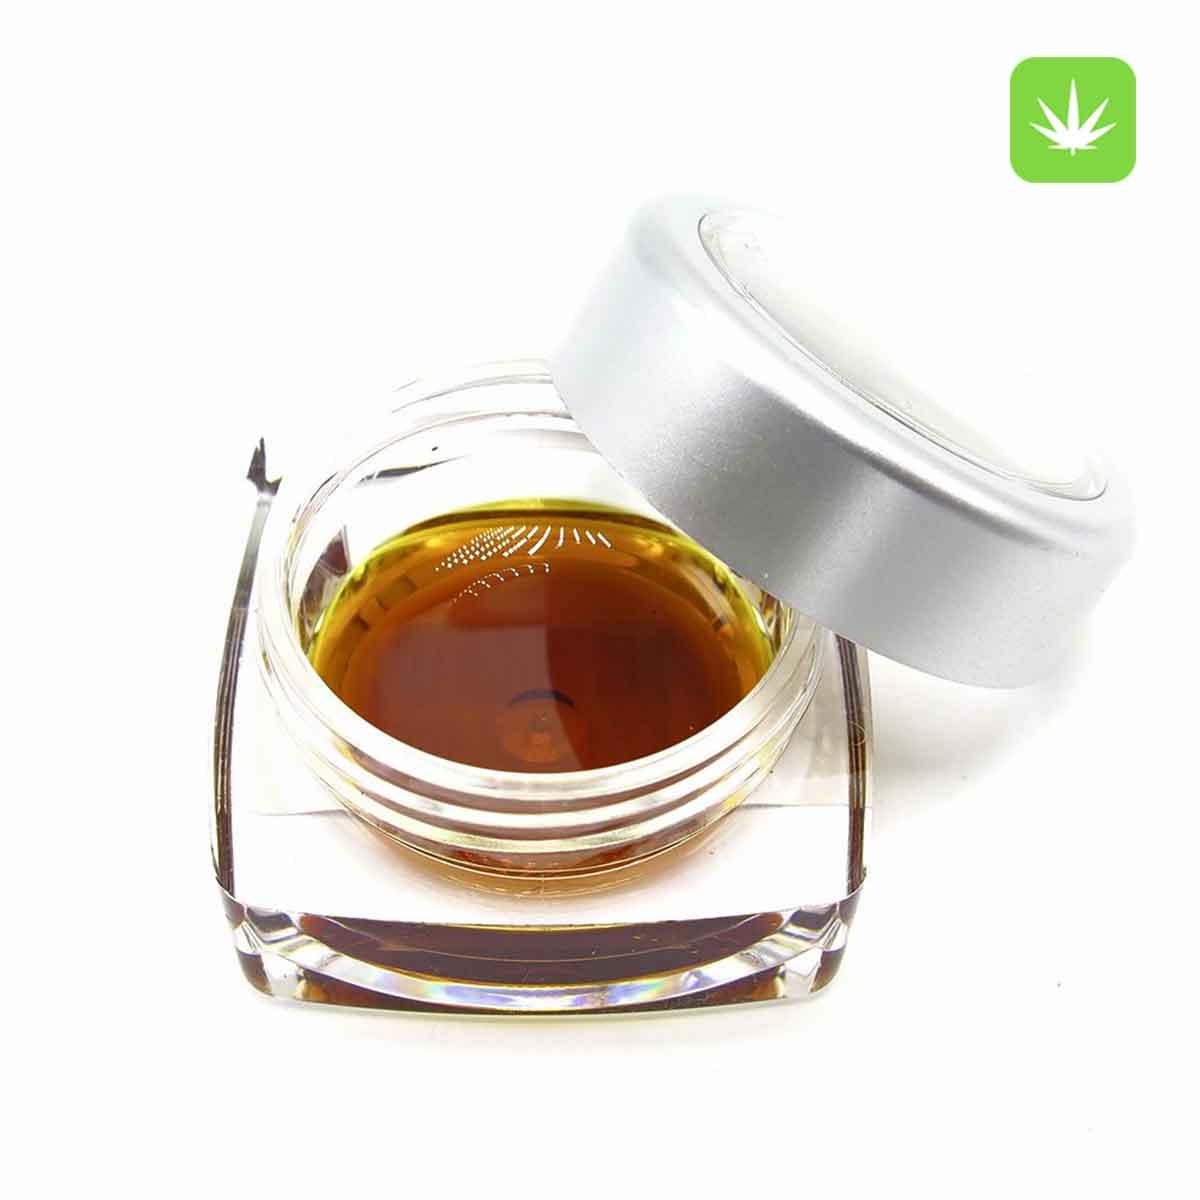 Tahoe OG Honey Oil Cannabis Avenue